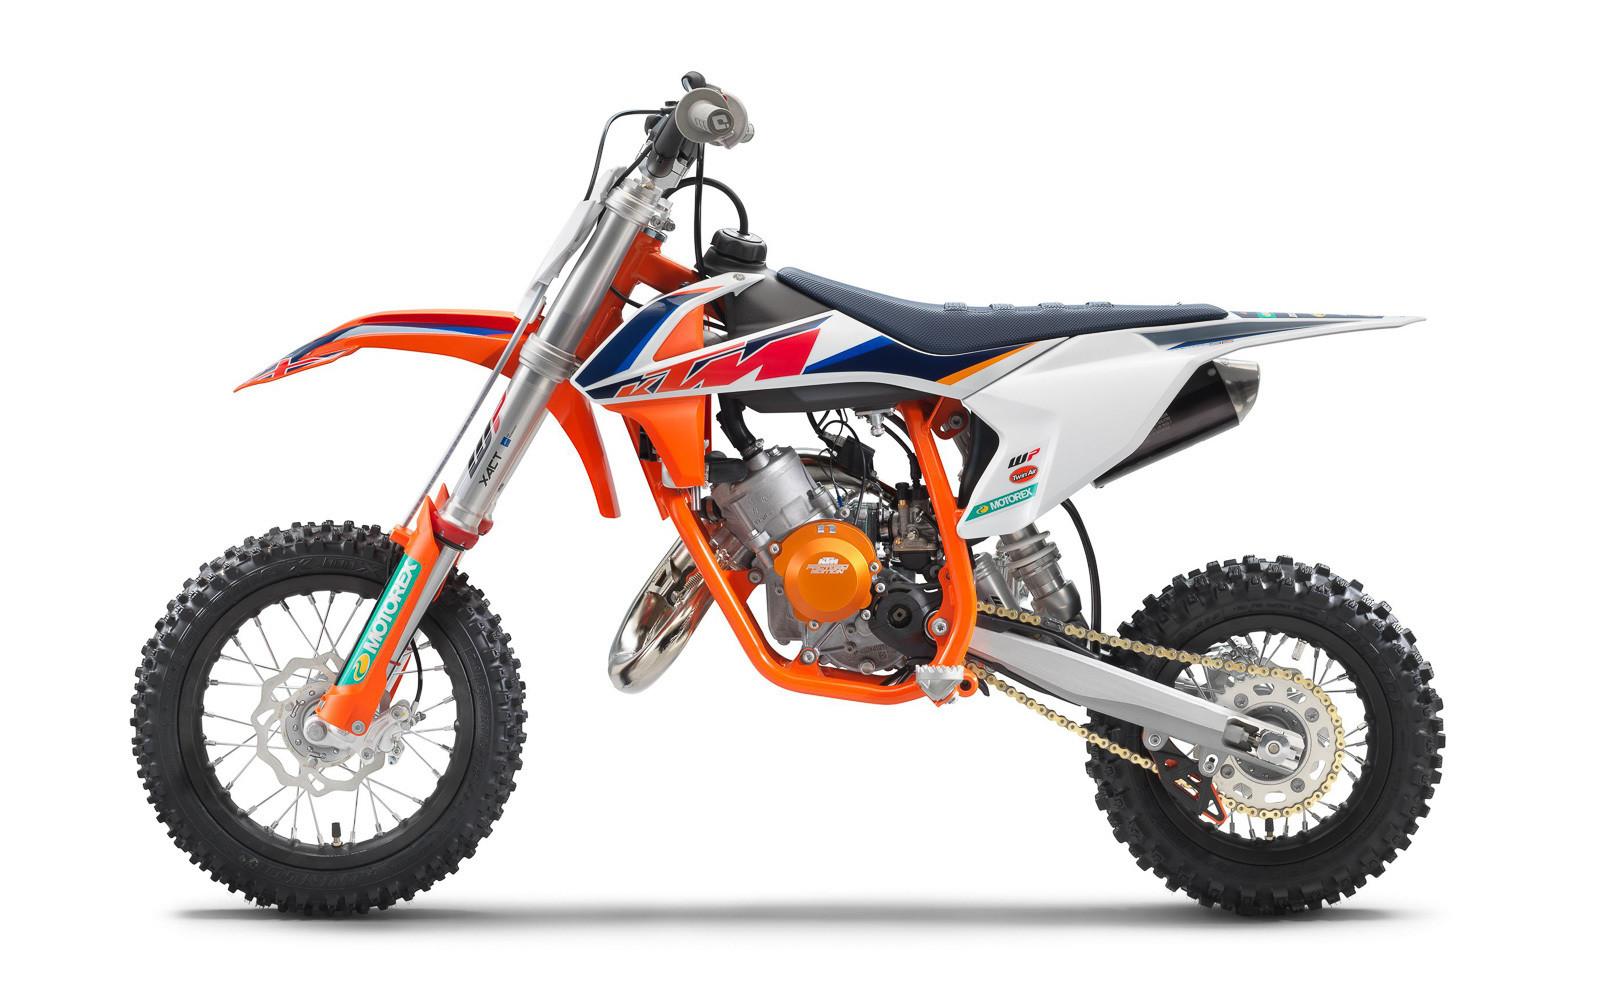 2021 KTM 50 Factory Edition.